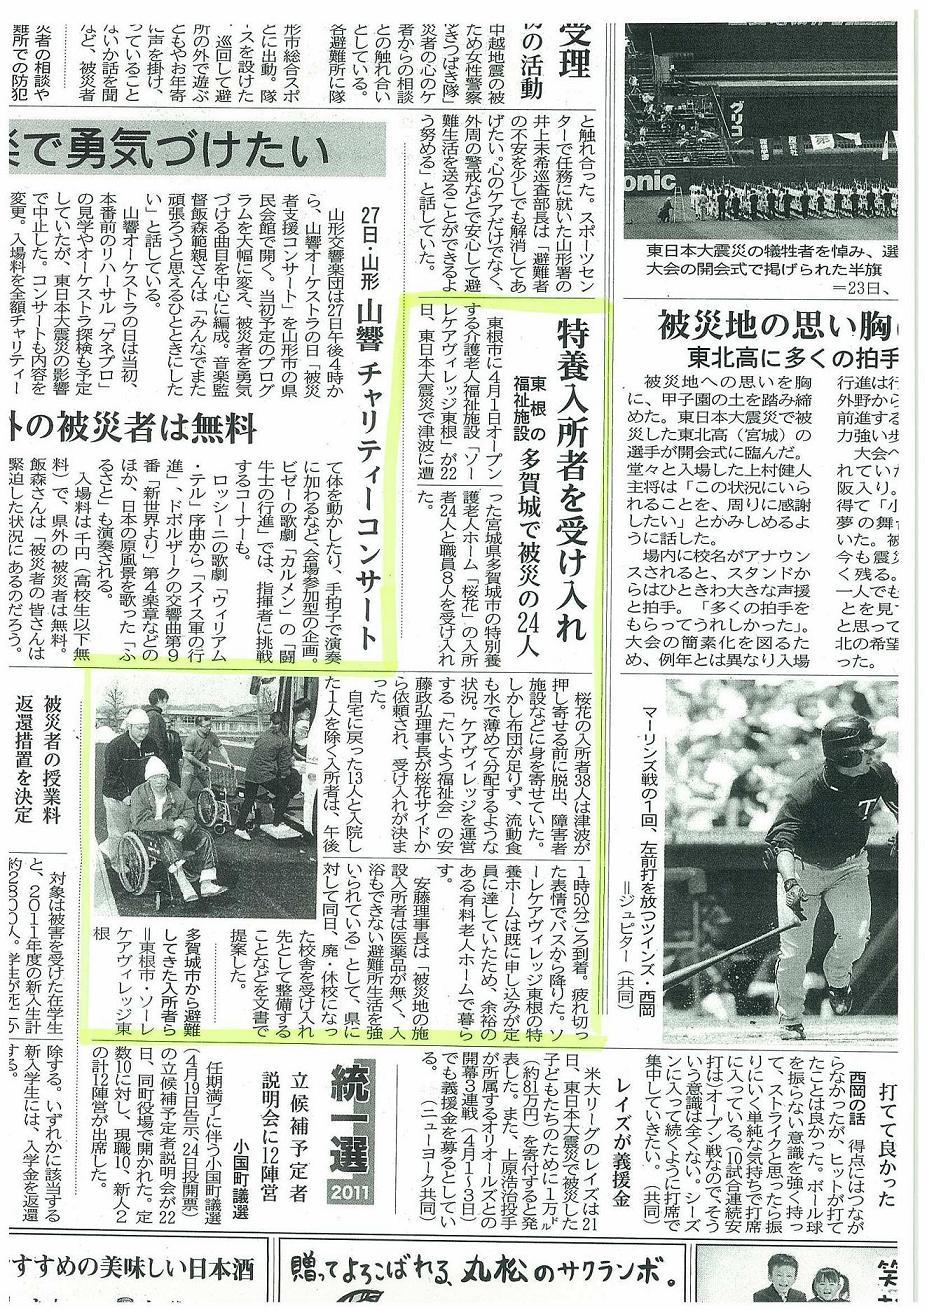 scan-4-1.jpg